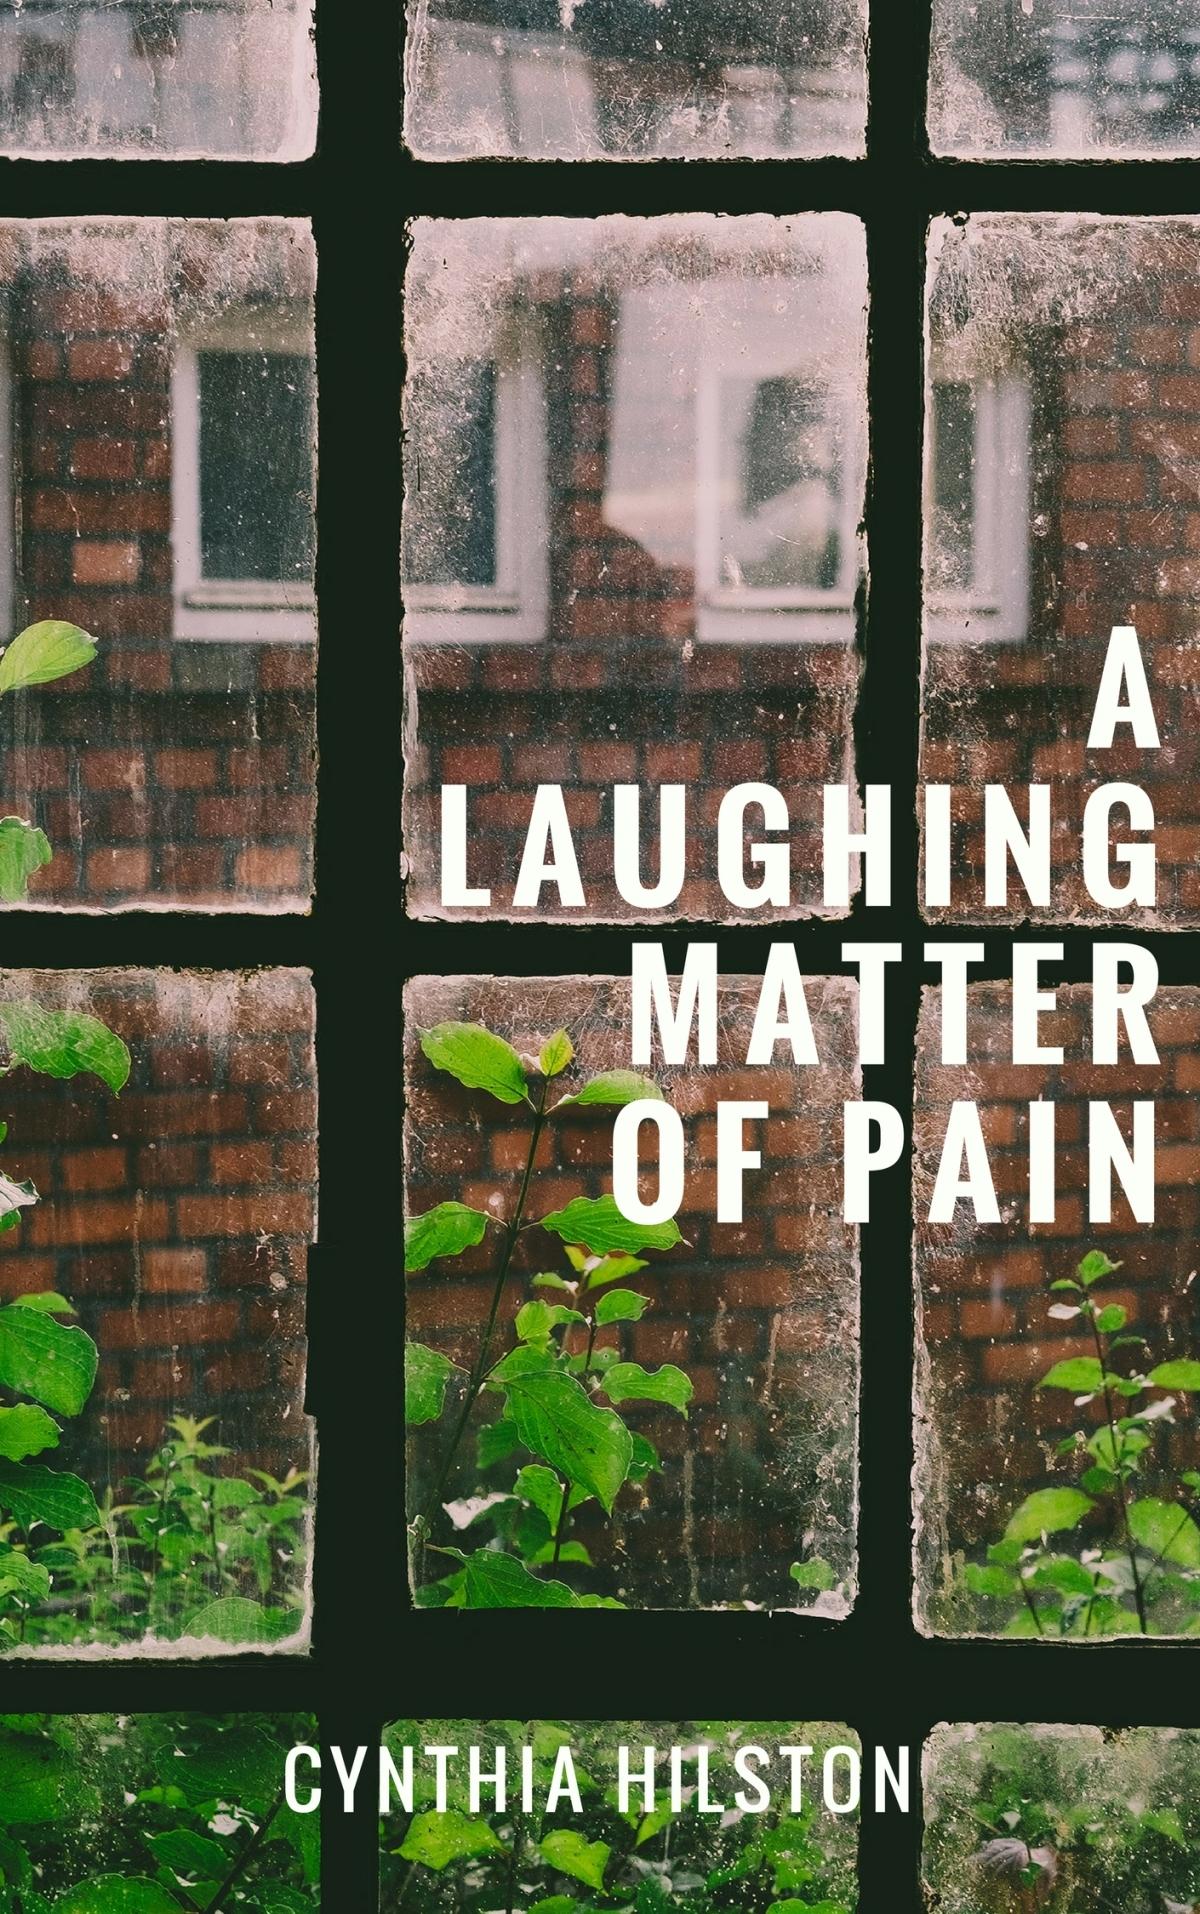 A Laughing Matter of Pain by Cynthia Hilston #BlogBlitz #PublicationDay (@cynthiahilston) @RaRaResources #ALaughingMatterOfPain